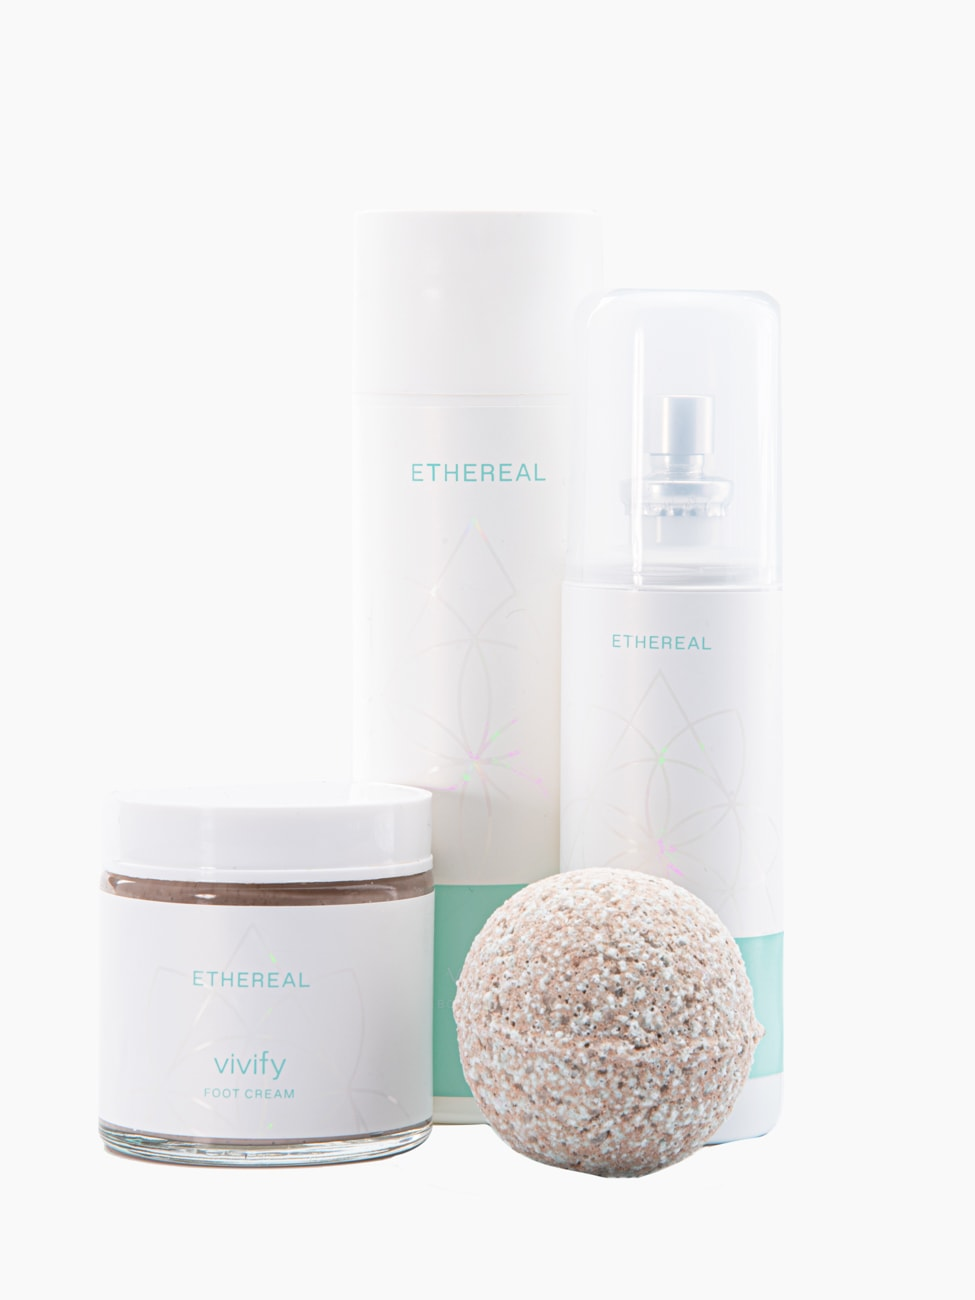 Vivify_Serie_Ethereal_Dermocosmetics_Skincare_Handmade_Greek_Products